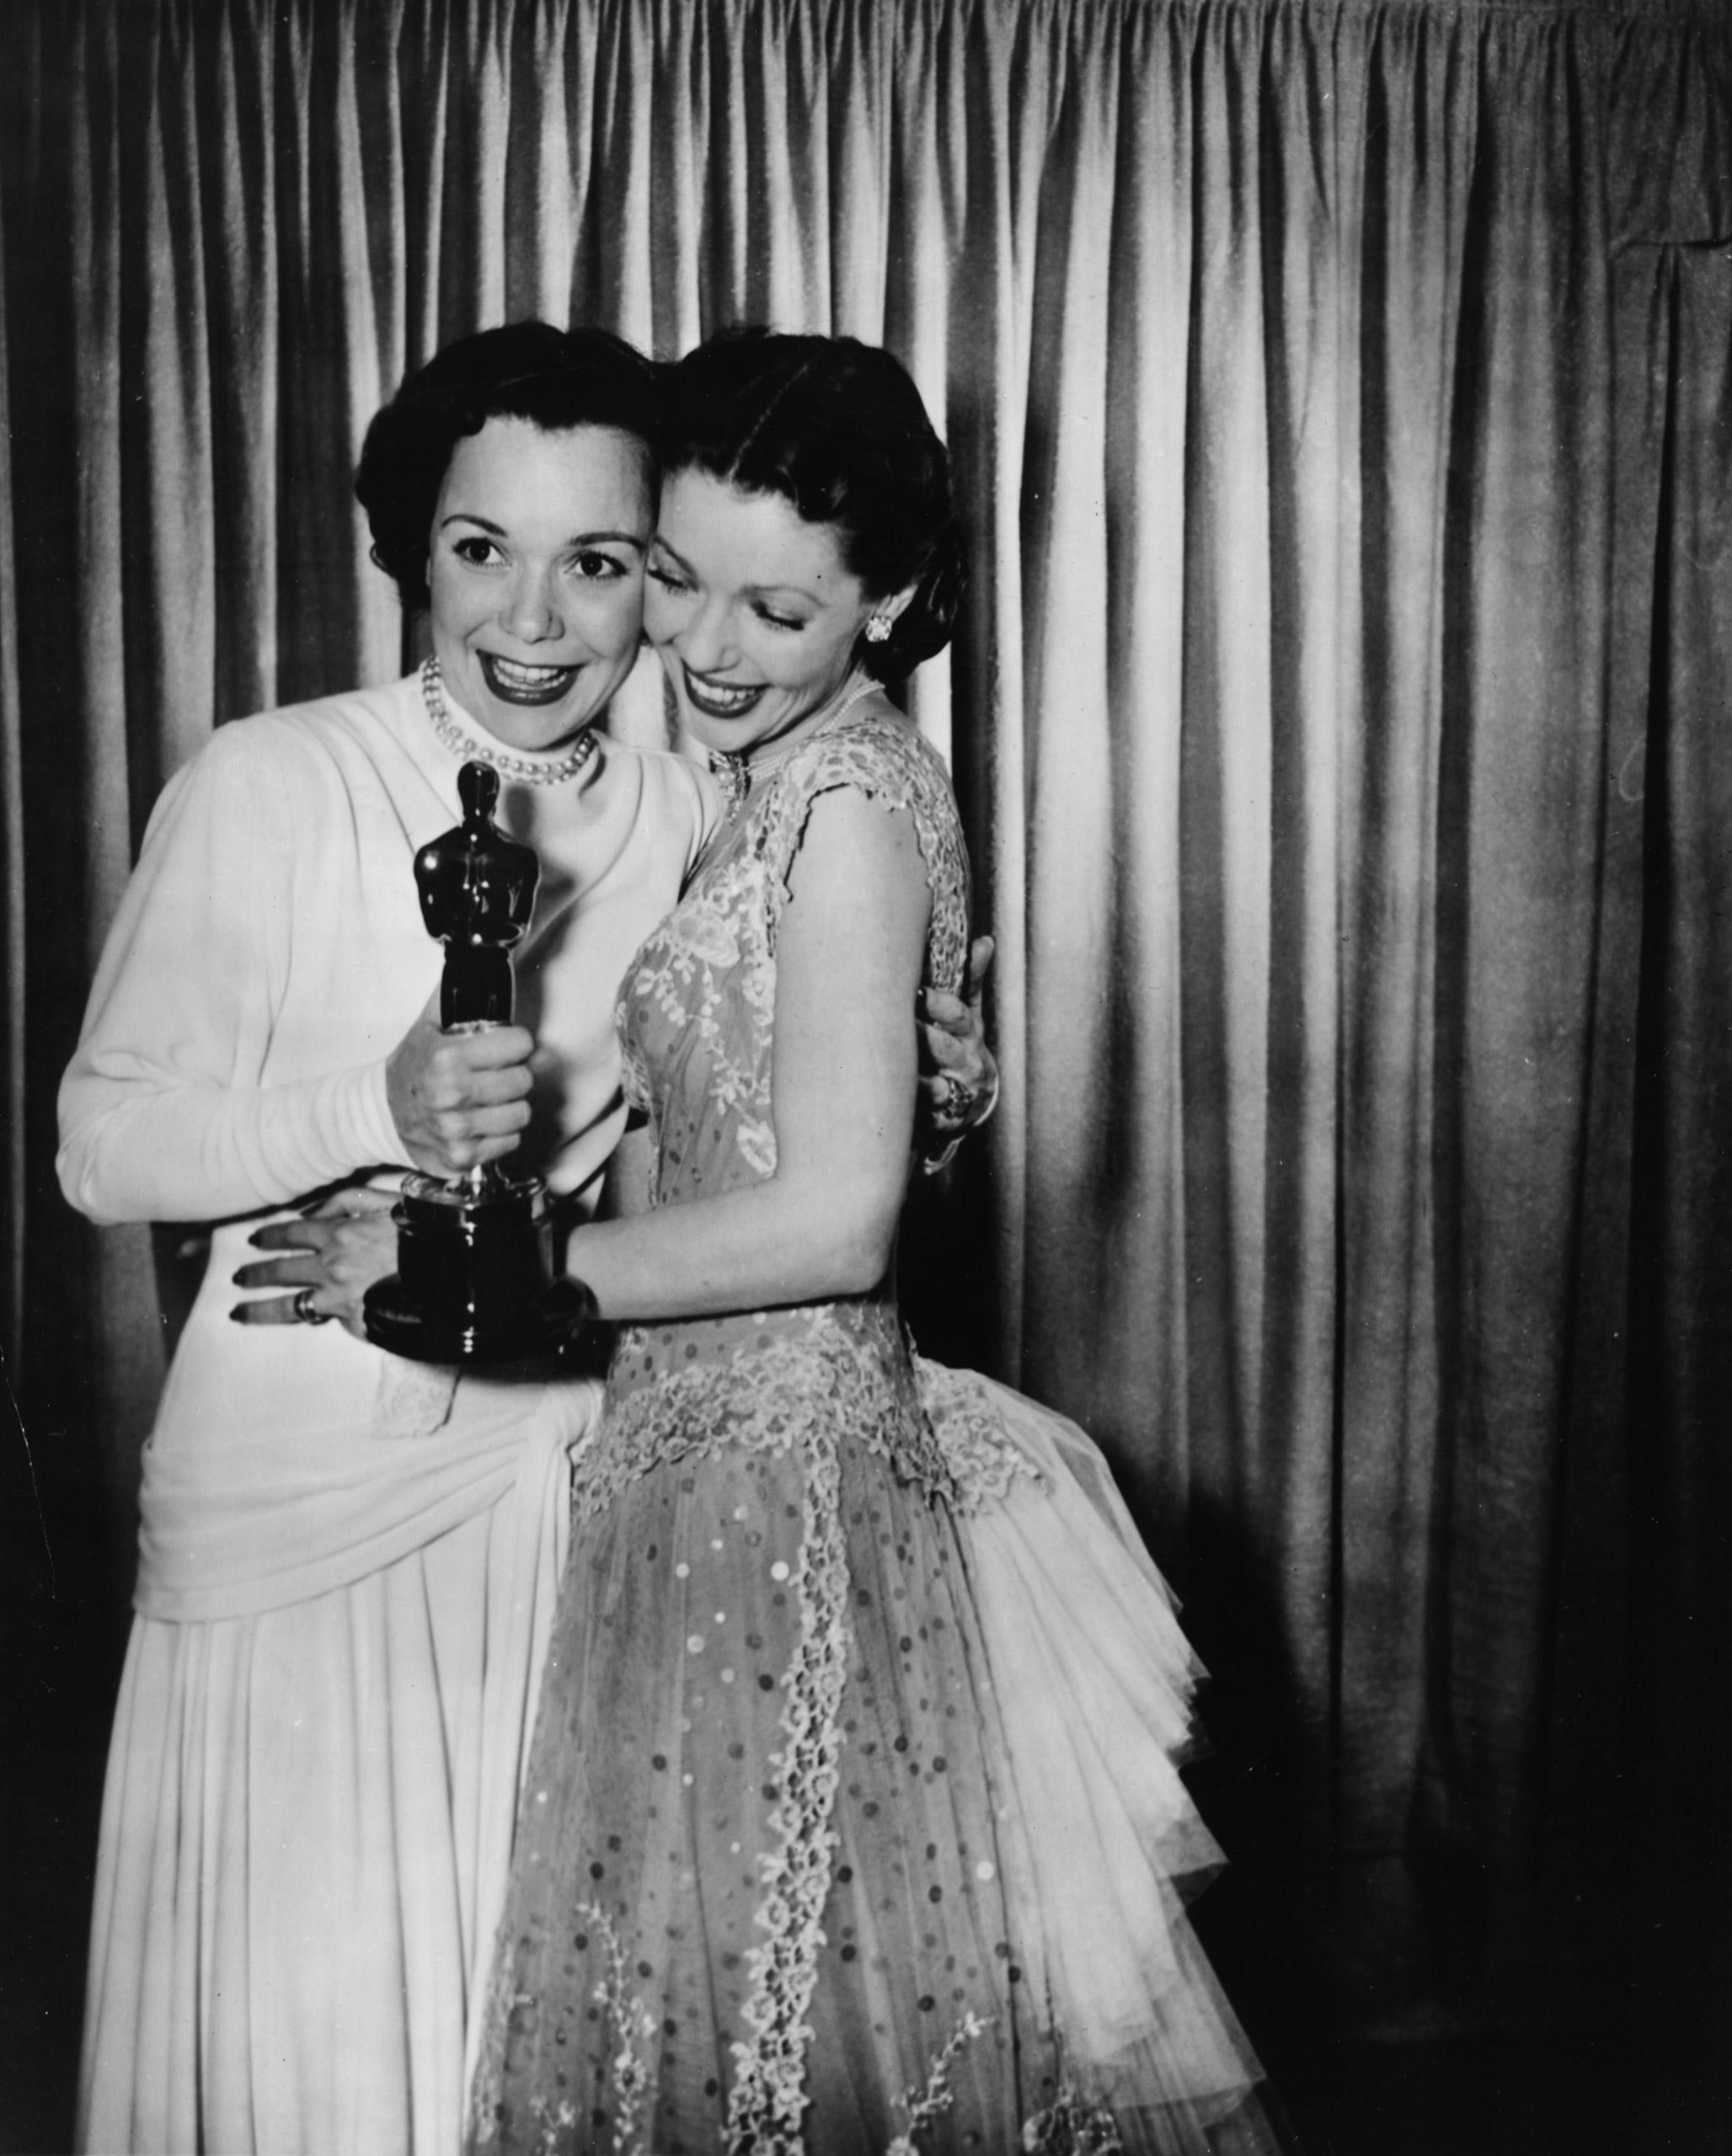 Loretta Young congratulating Jane Wyman at the Academy Awards, 1949.